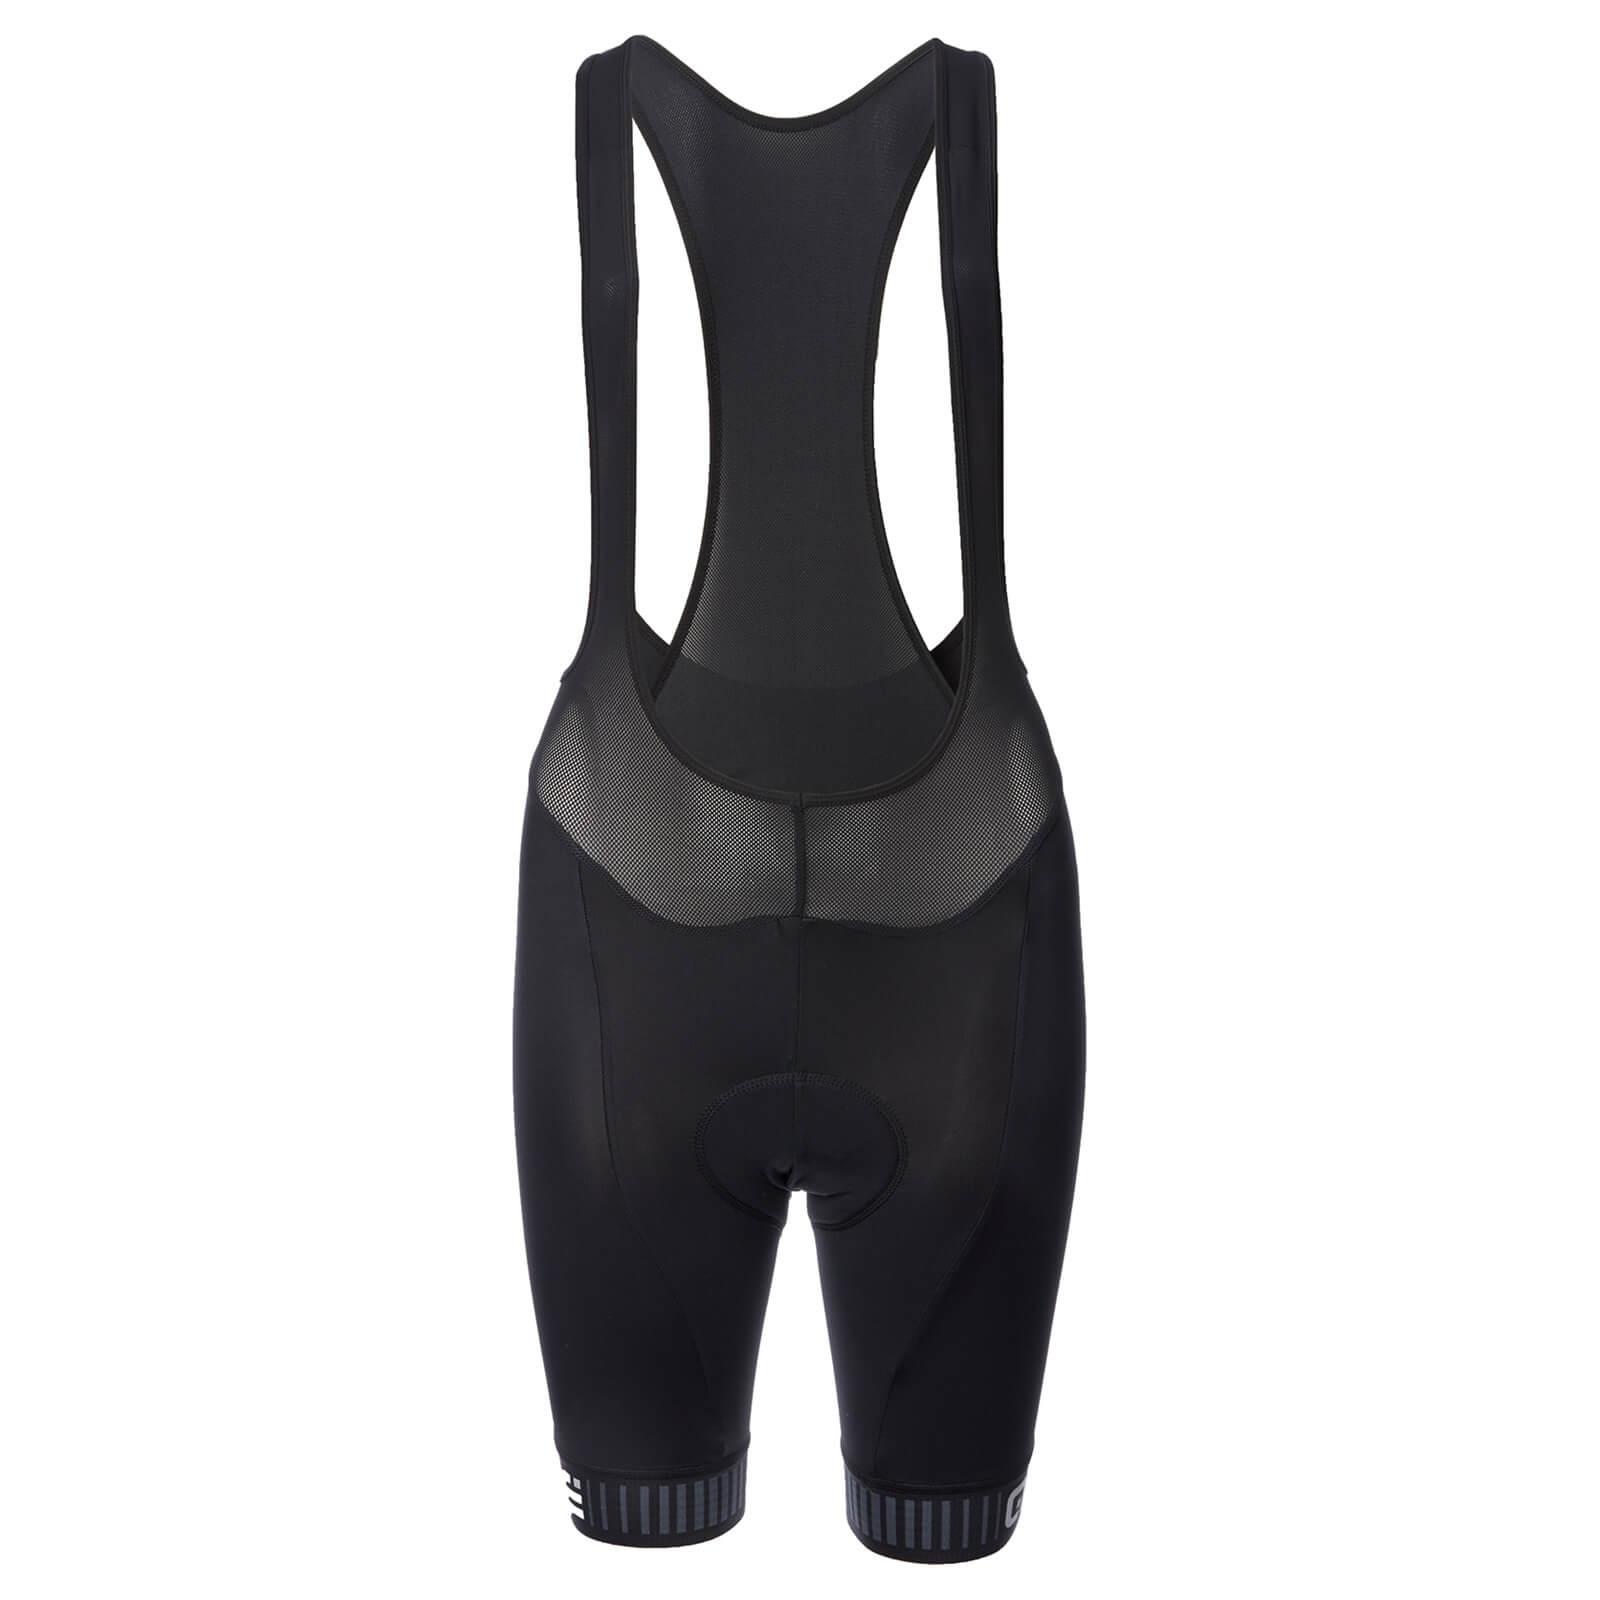 Alé Women's Solid Traguardo Bib Shorts - M - Black